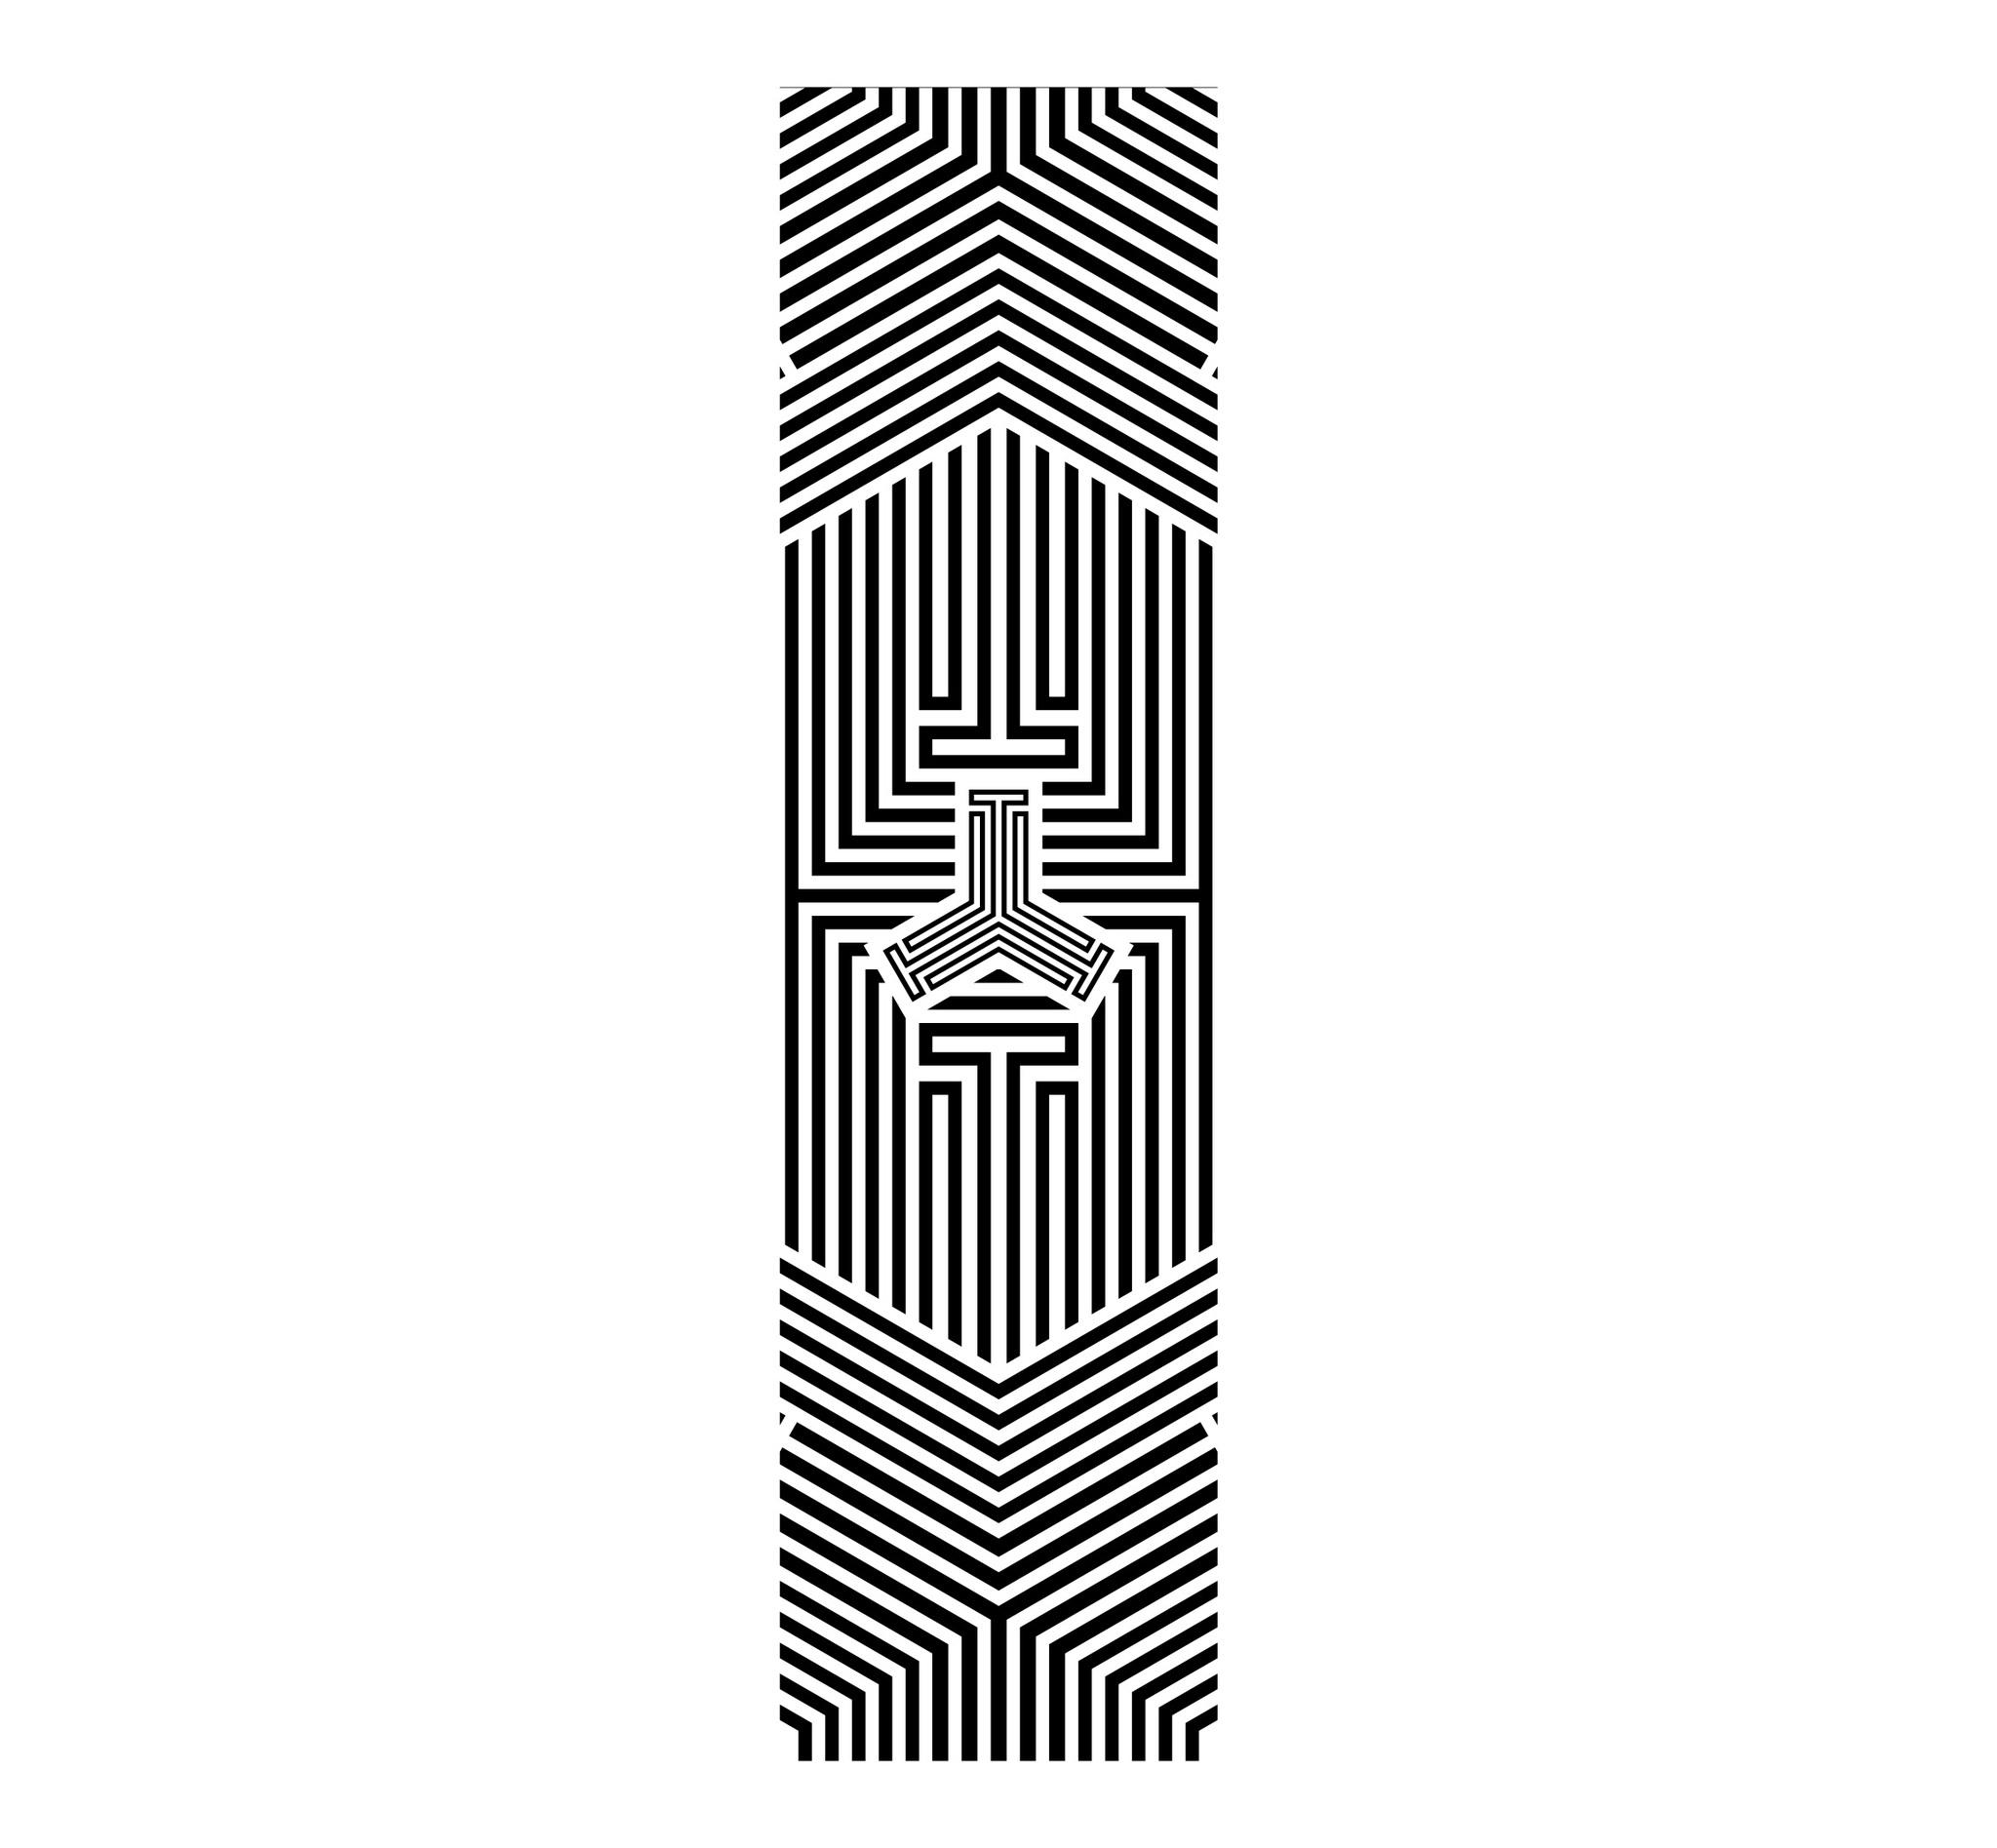 Наждак Triad Clear cast grip 23 x 6